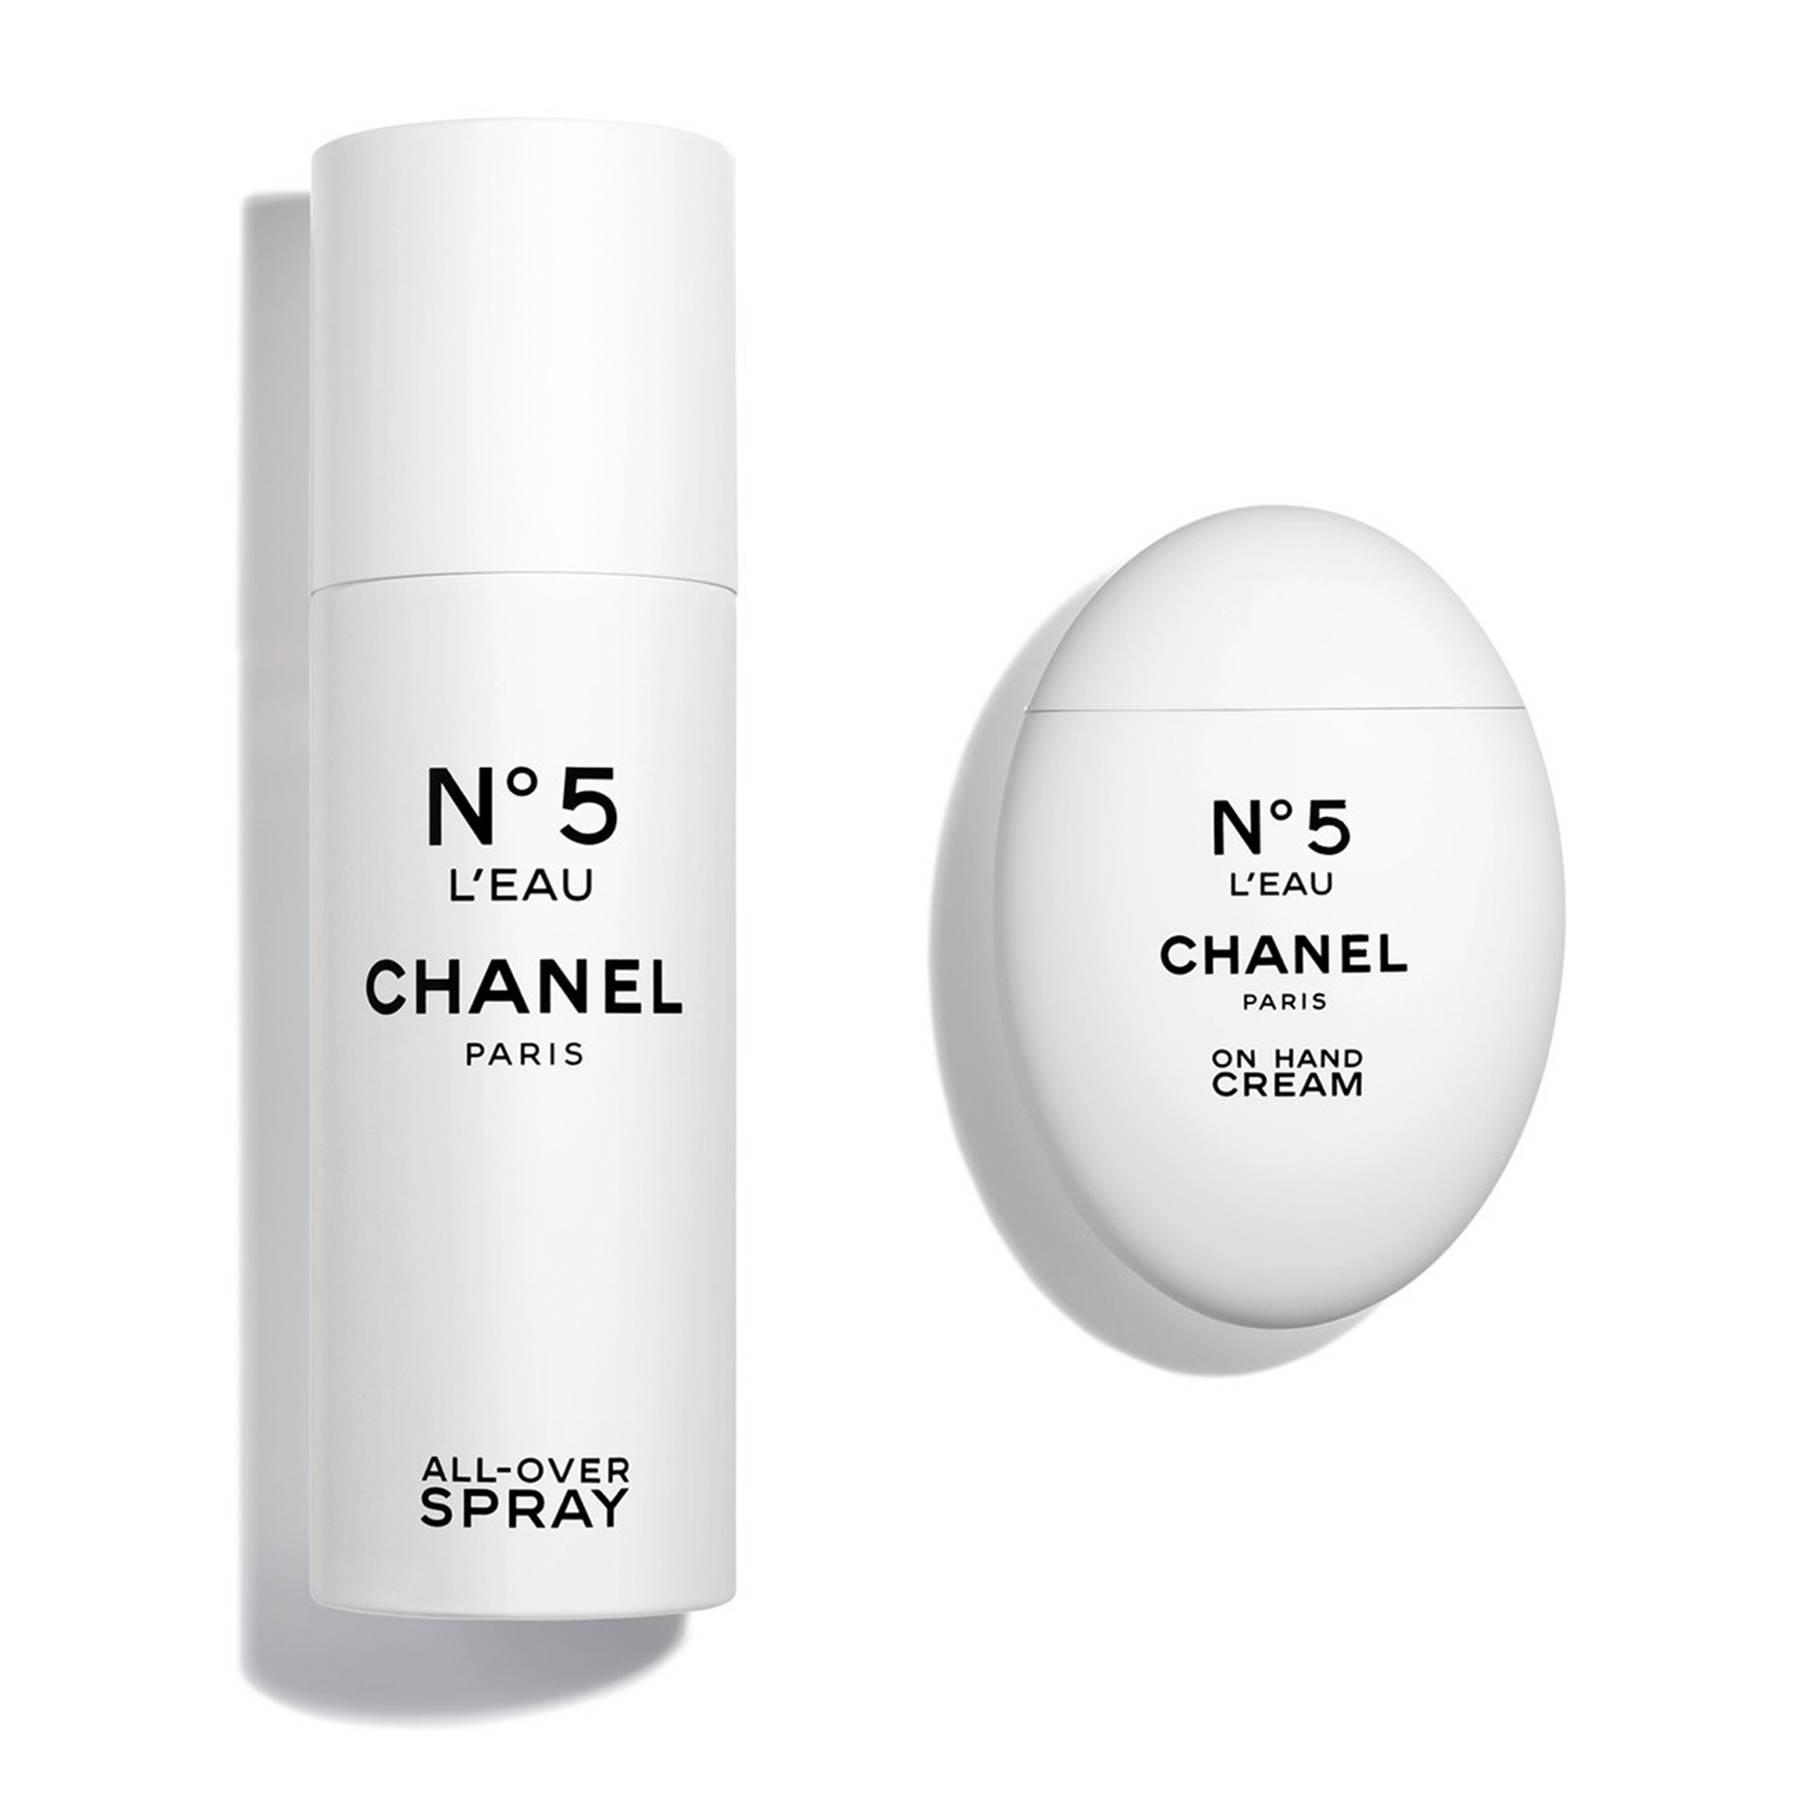 1f0bbe27e5 Chanel No 5 L'Eau spray | Tatler